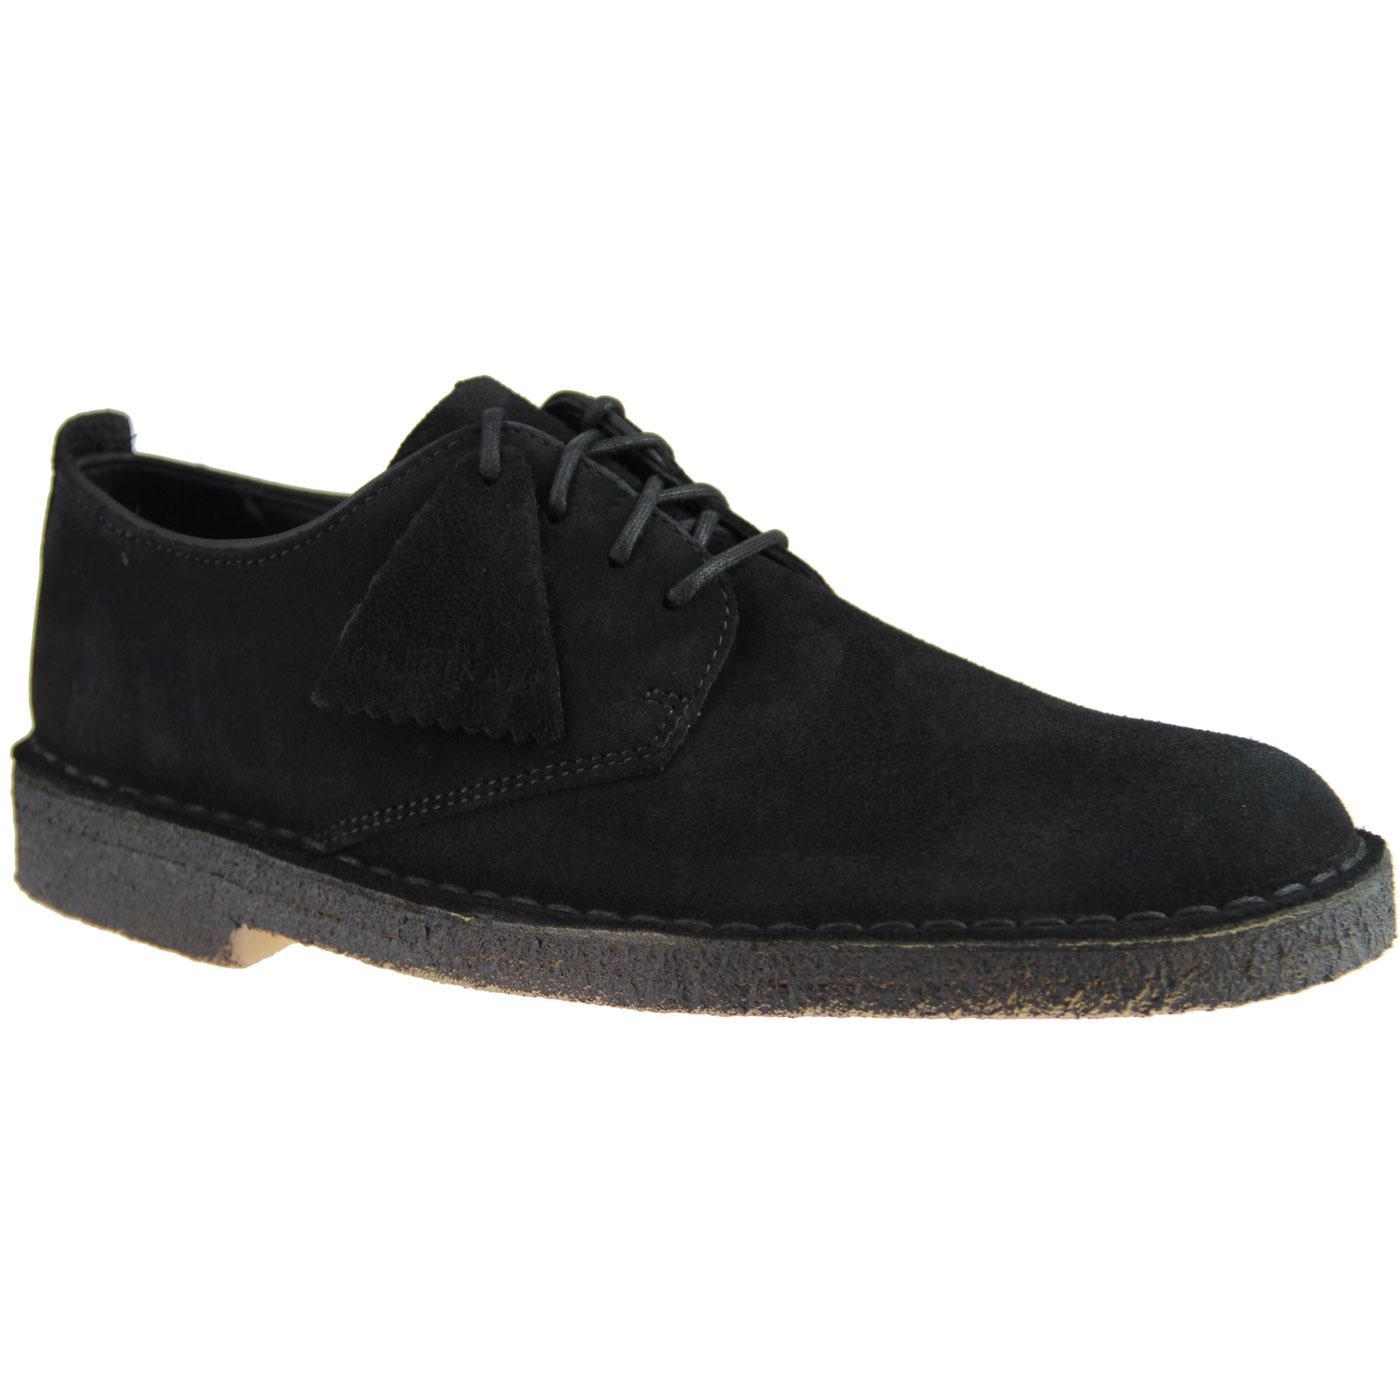 Desert CLARKS ORIGINALS Mens Mod Suede Shoes Black